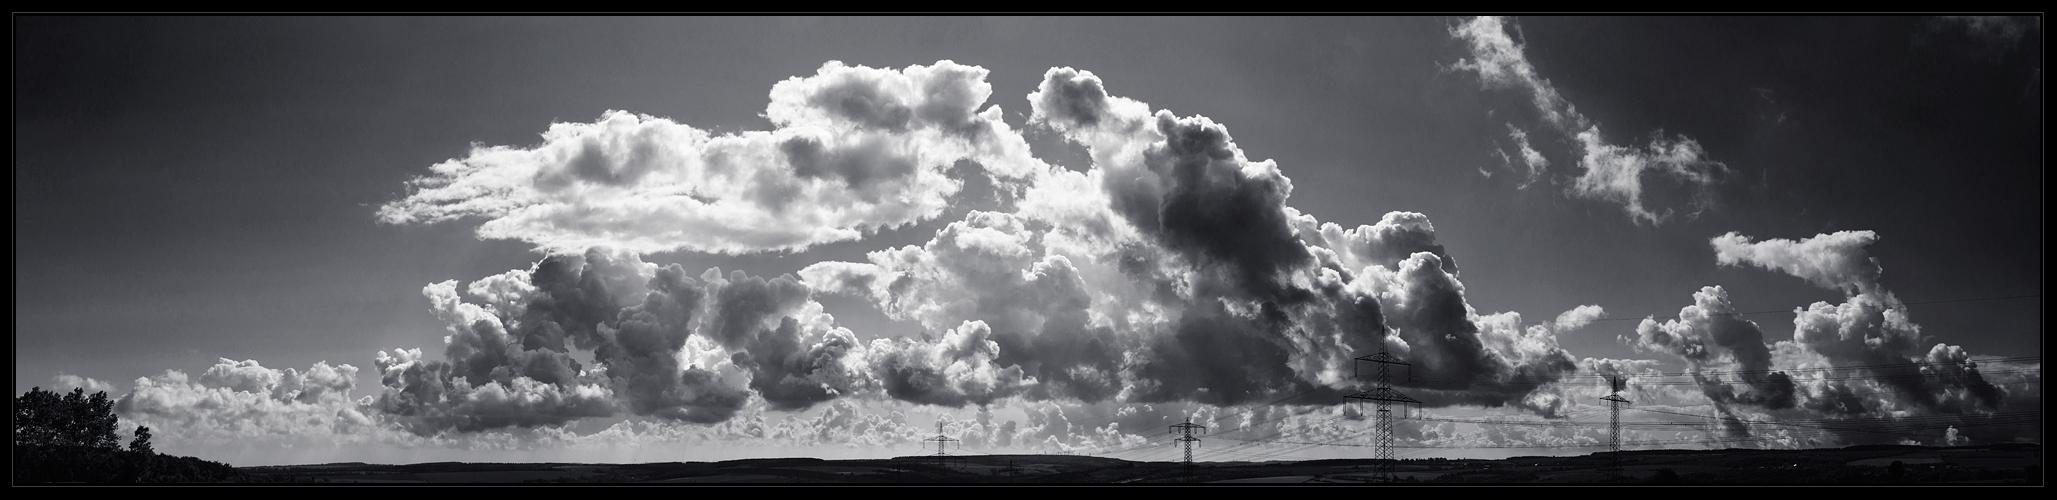 *cloudy